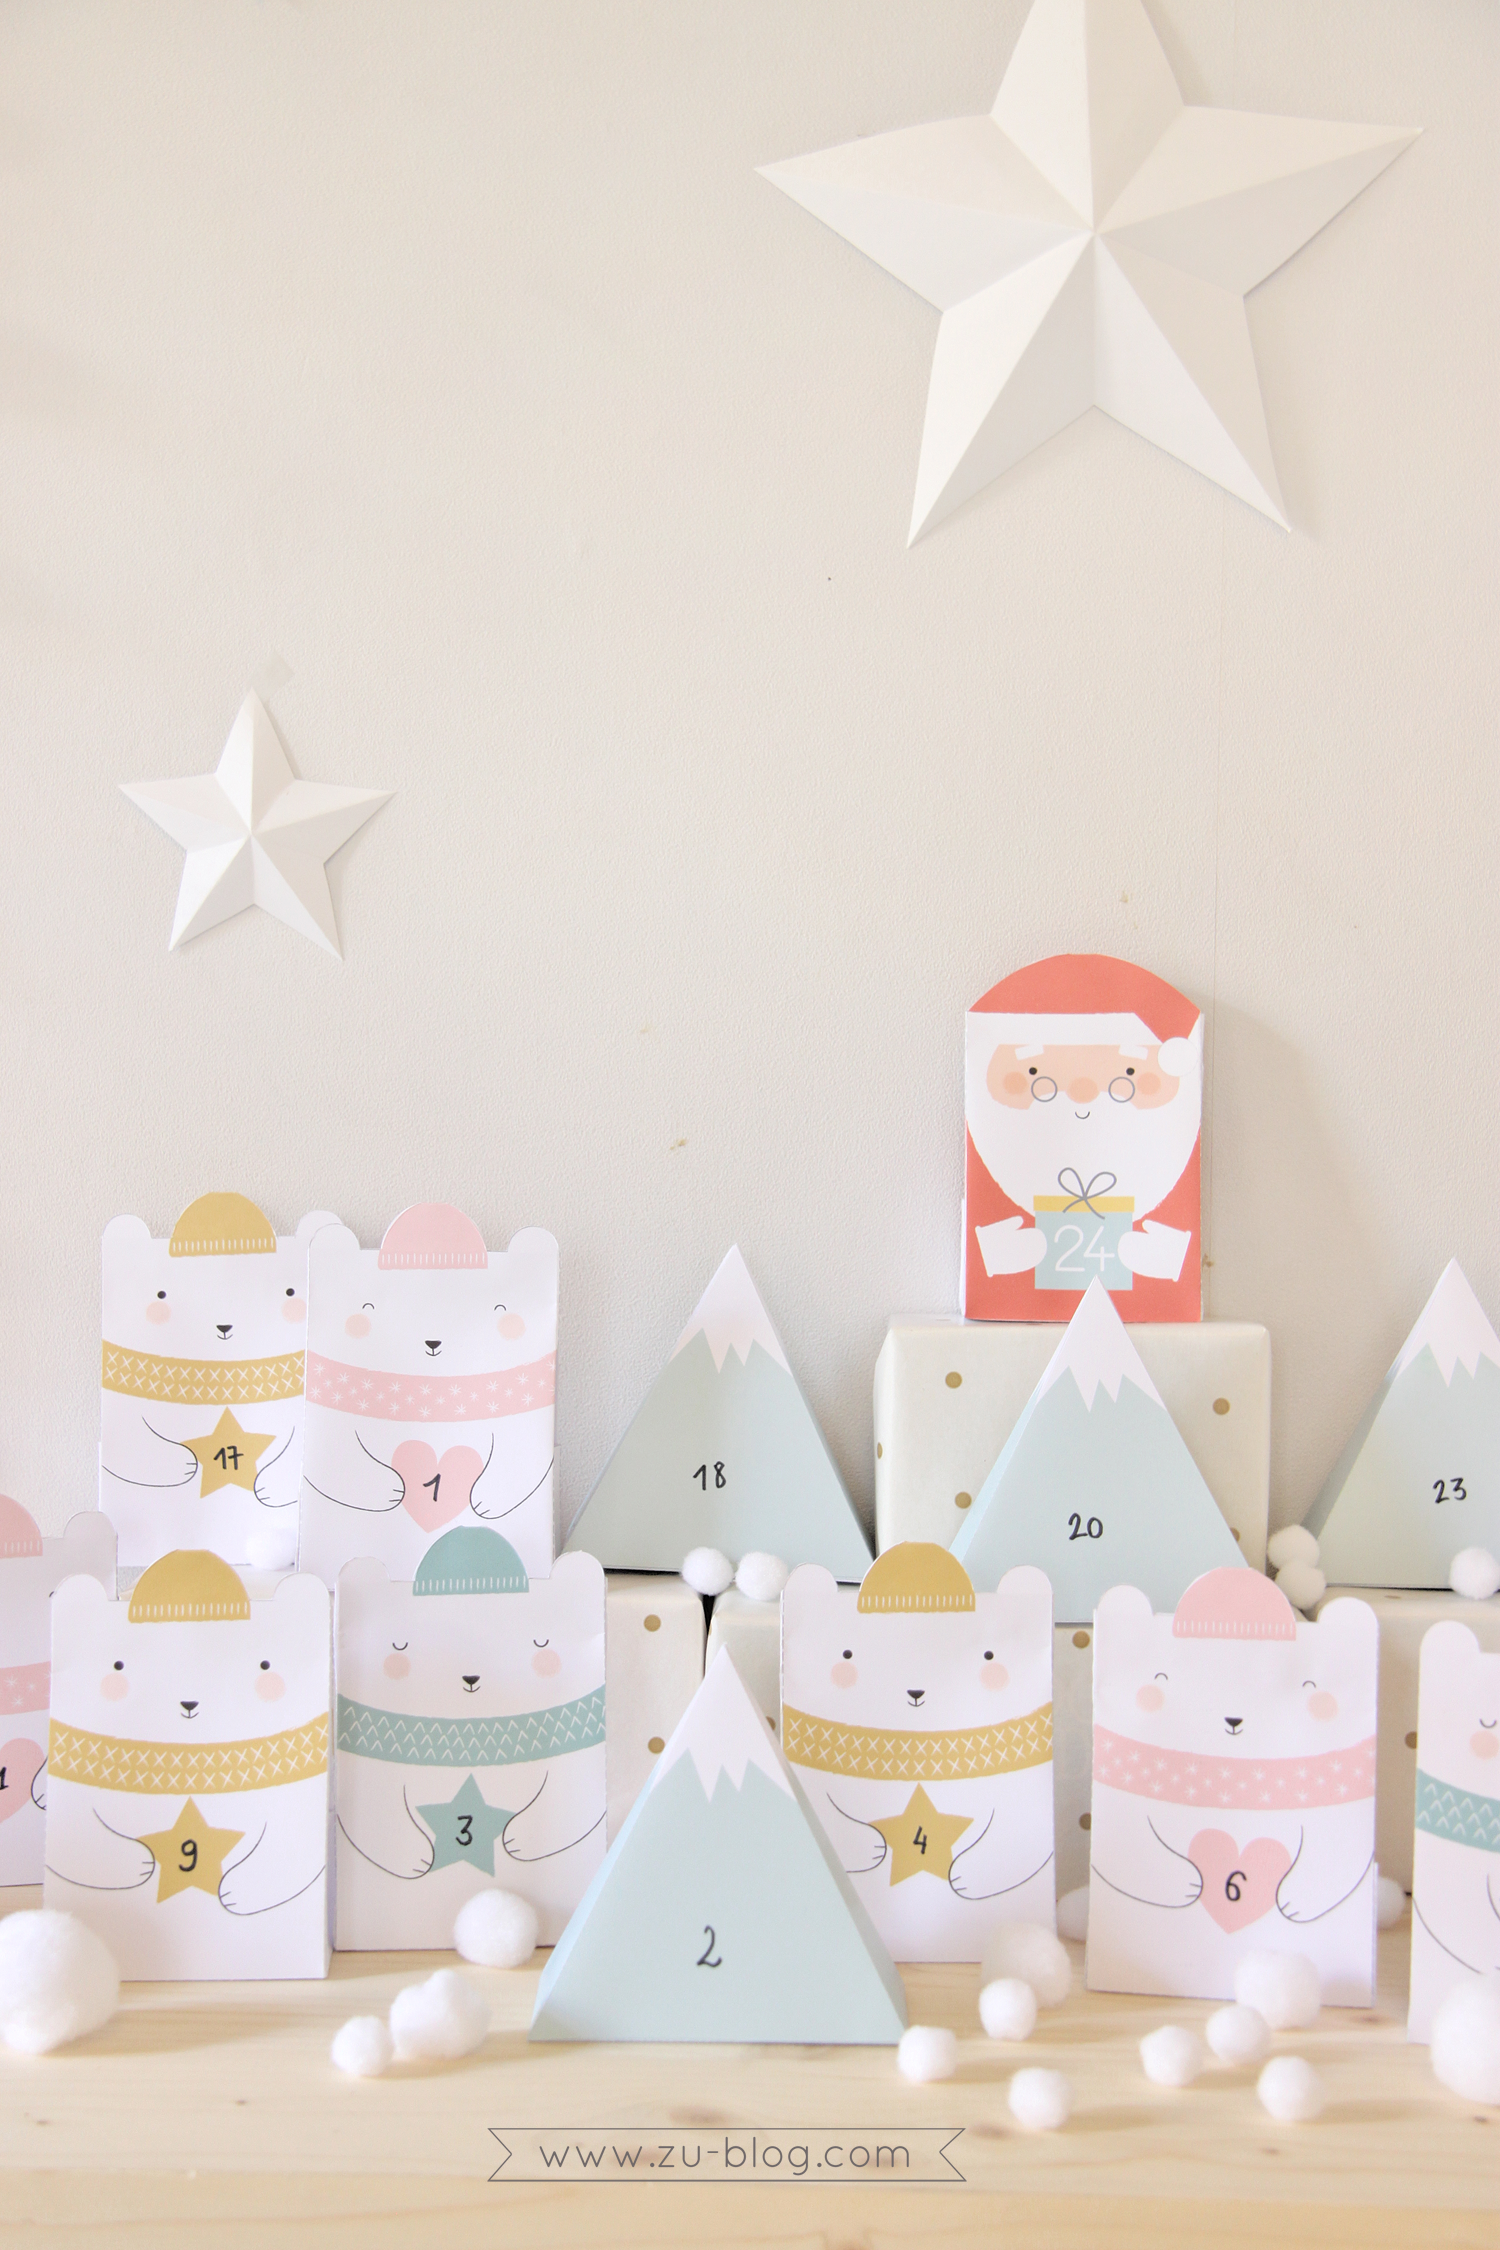 Top 10 DIY Printable Advent Calendar Ideas for Christmas Countdown